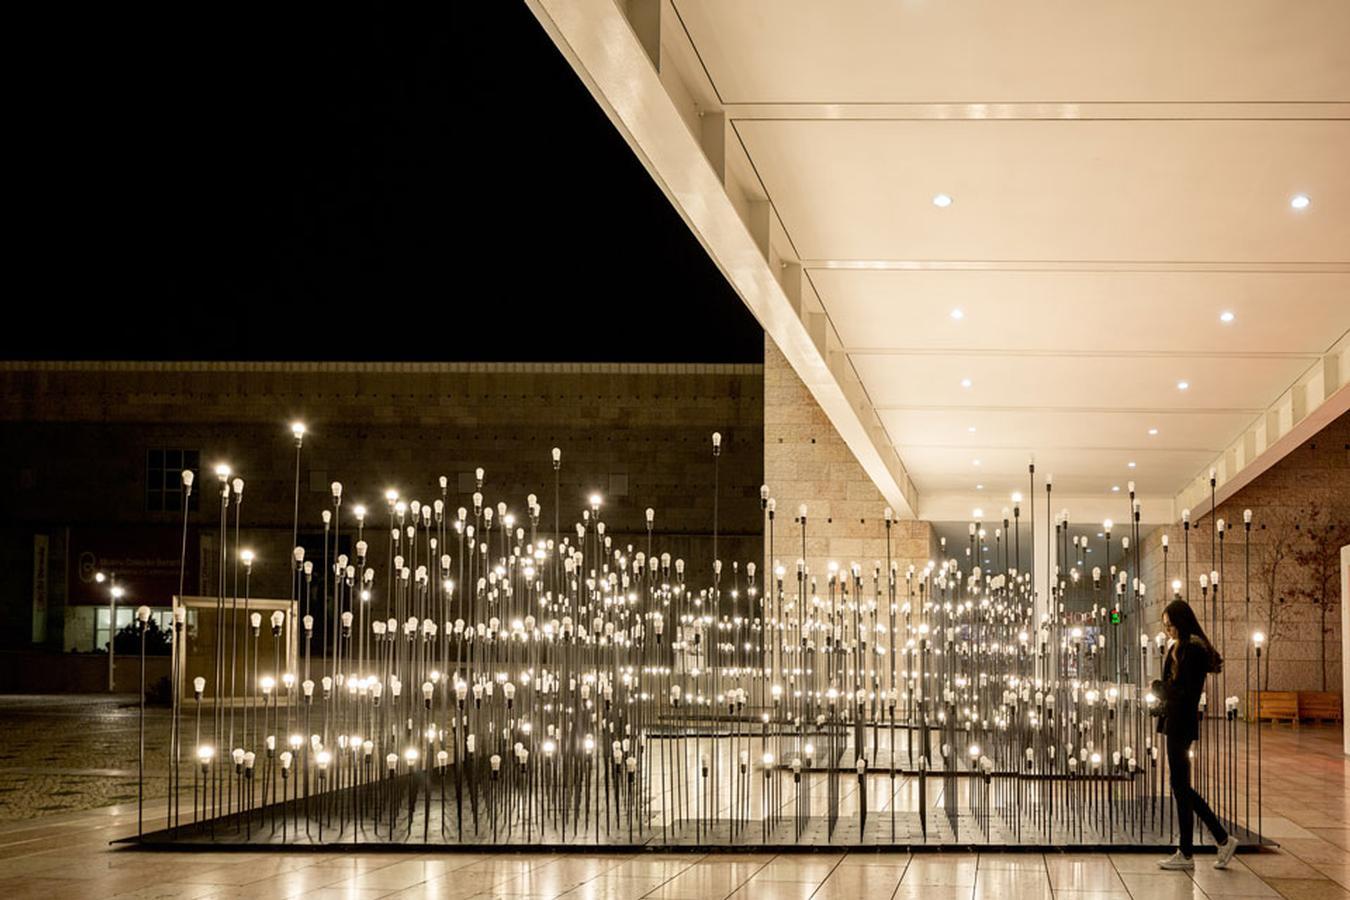 LEDscape 6